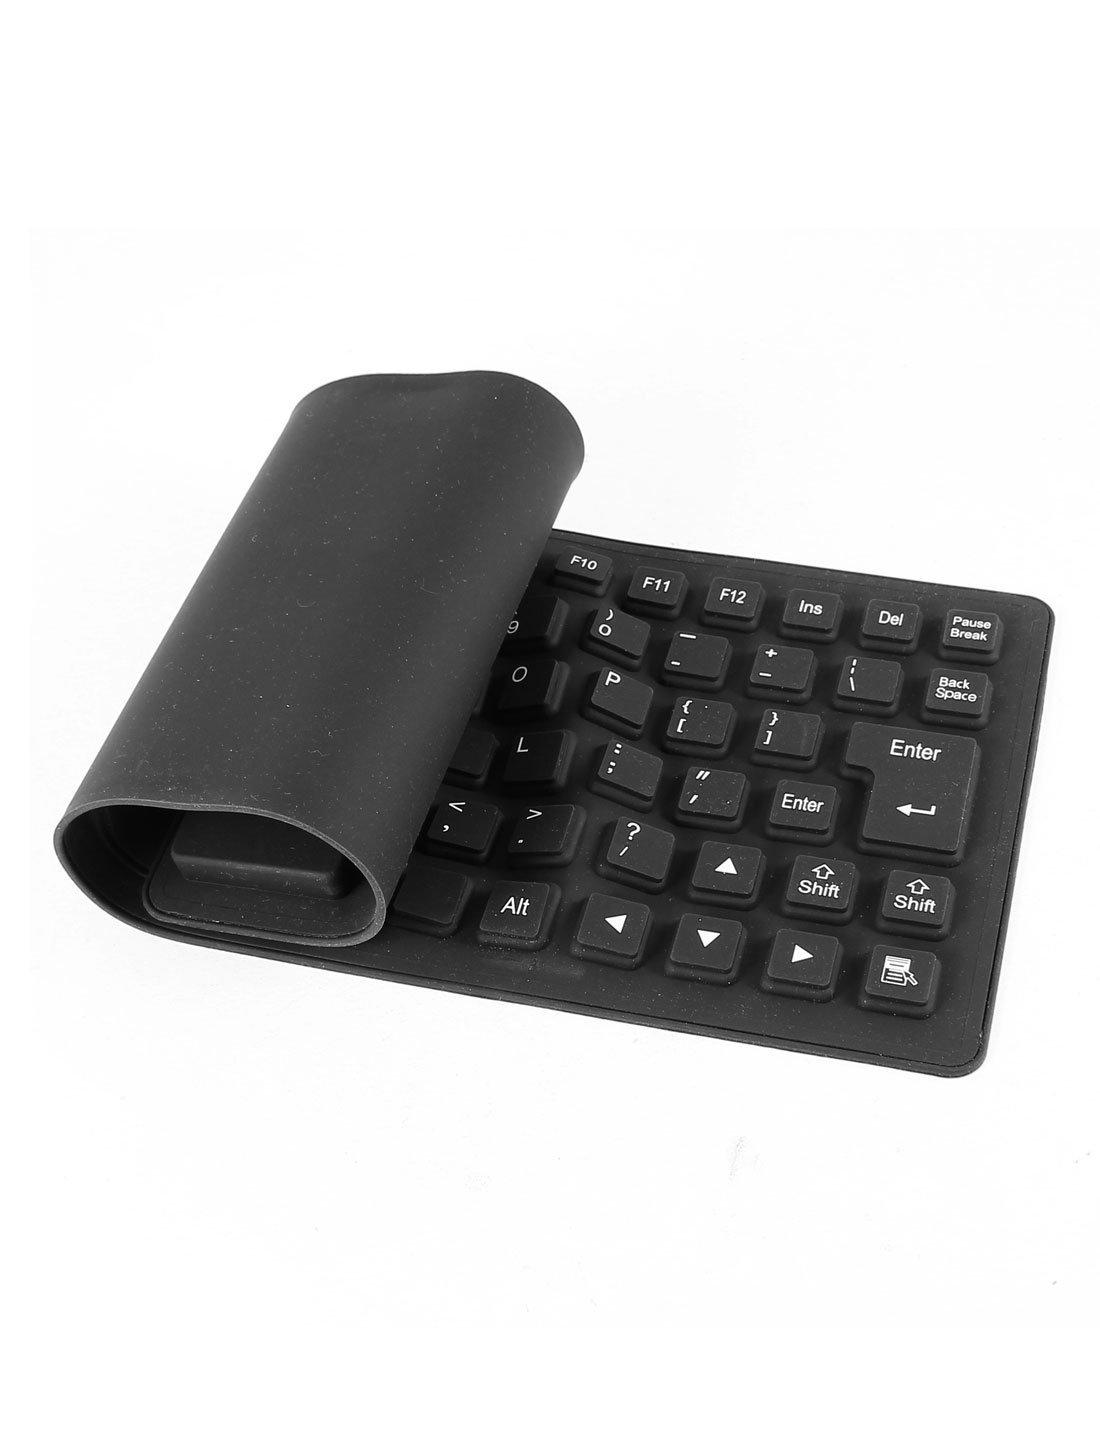 Amazon.com: Laváveis ??85 Chaves Arregace Silicone USB 2.0 Teclado flexível preto: Electronics